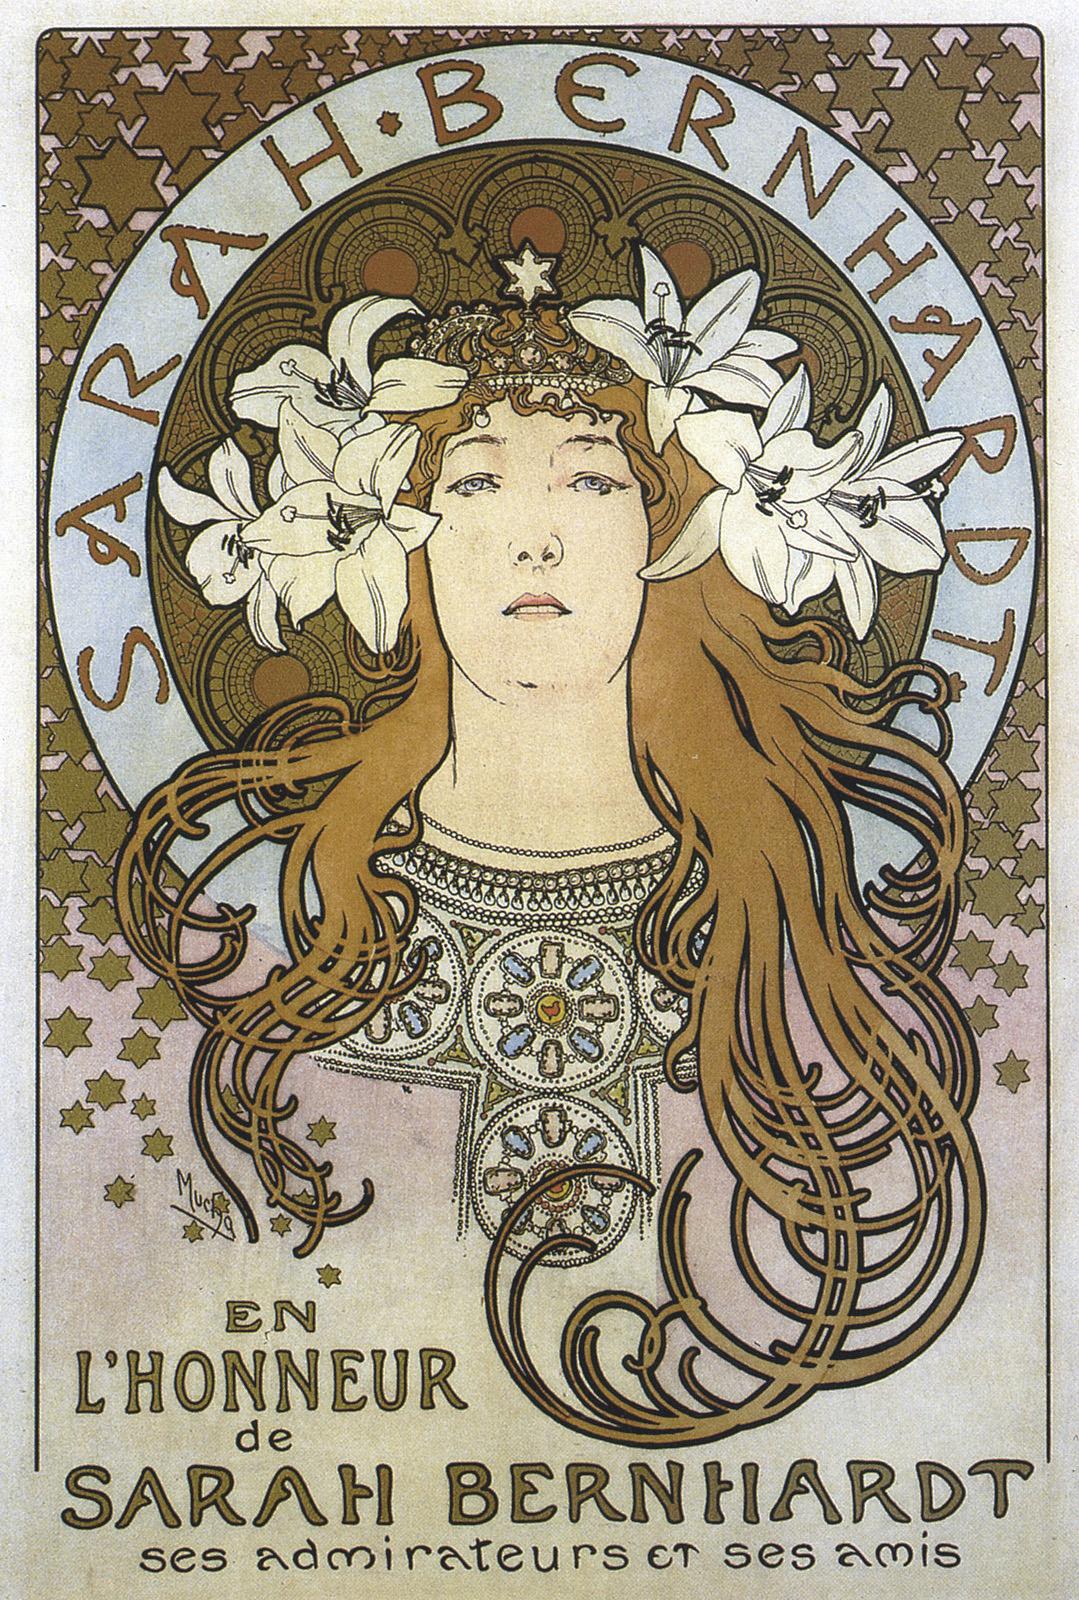 Alphonse Mucha: Poster of Sarah Bernhardt for 'La Plume' Magazine (1897)